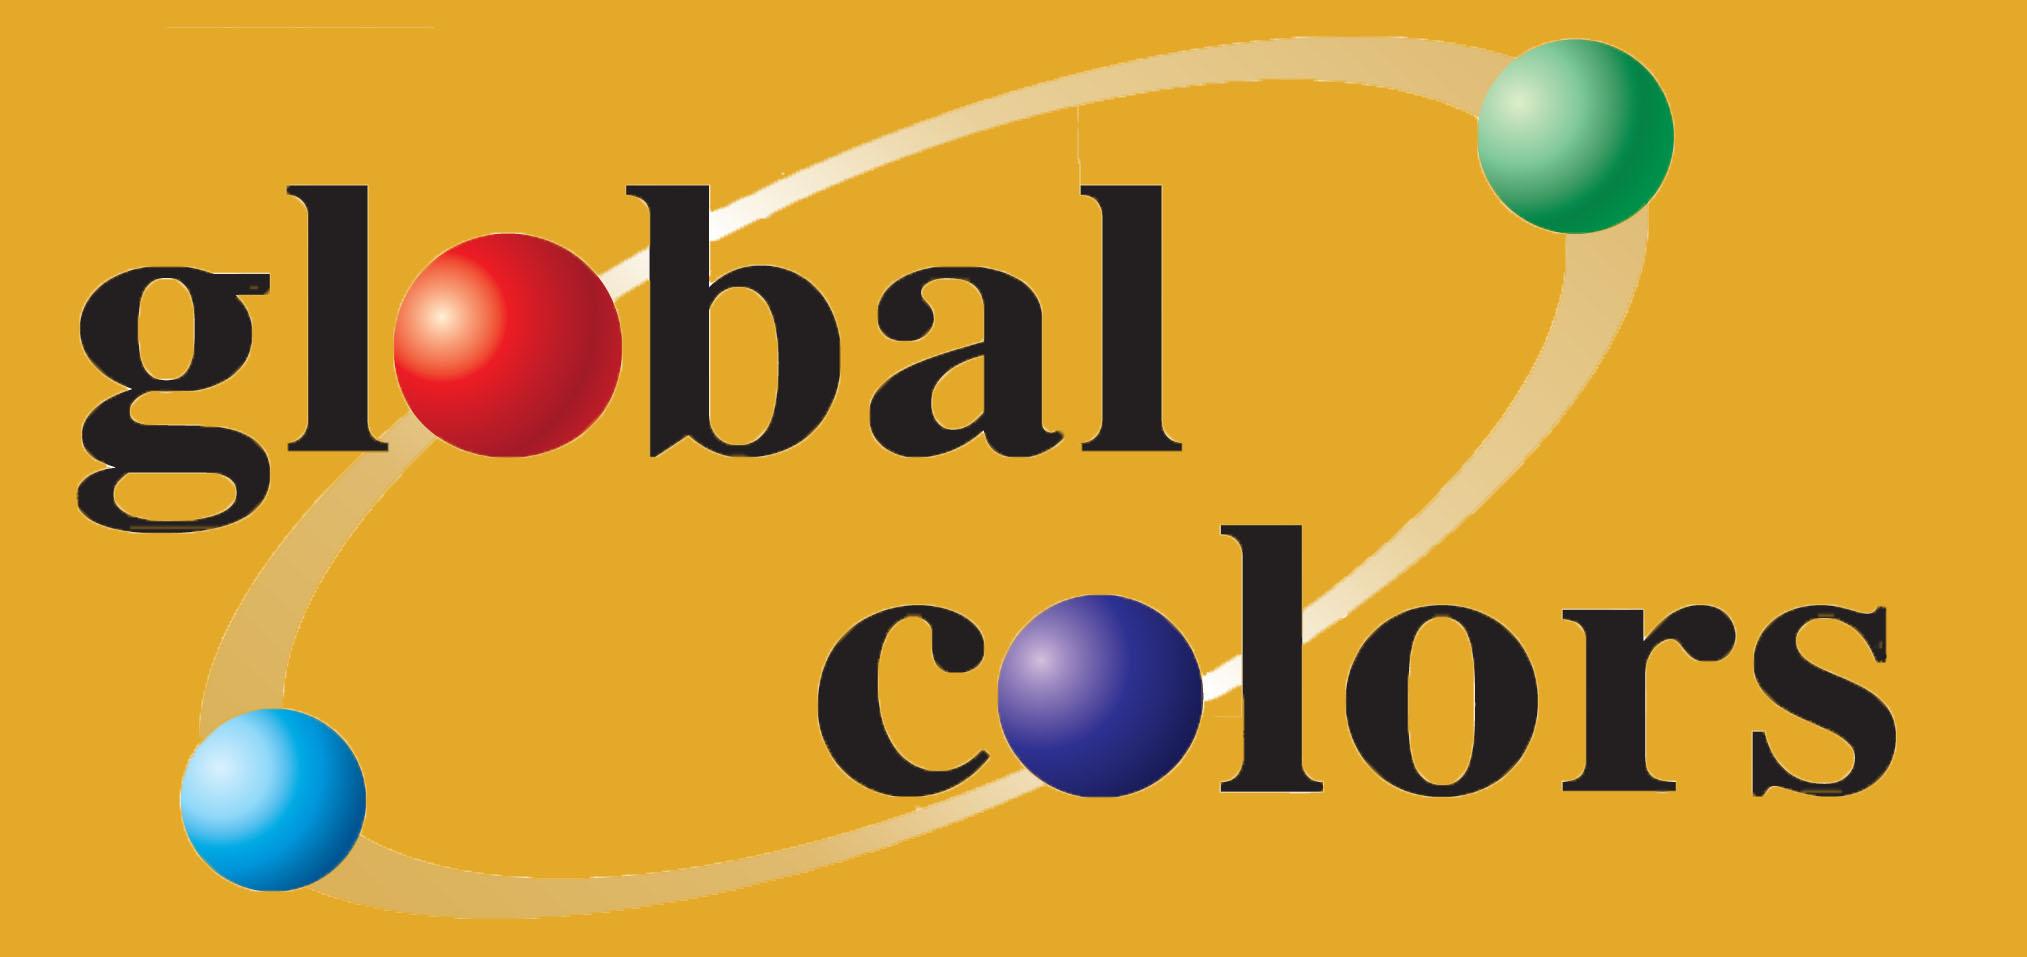 Работа в компании «Глобал колорс» в Тихвина